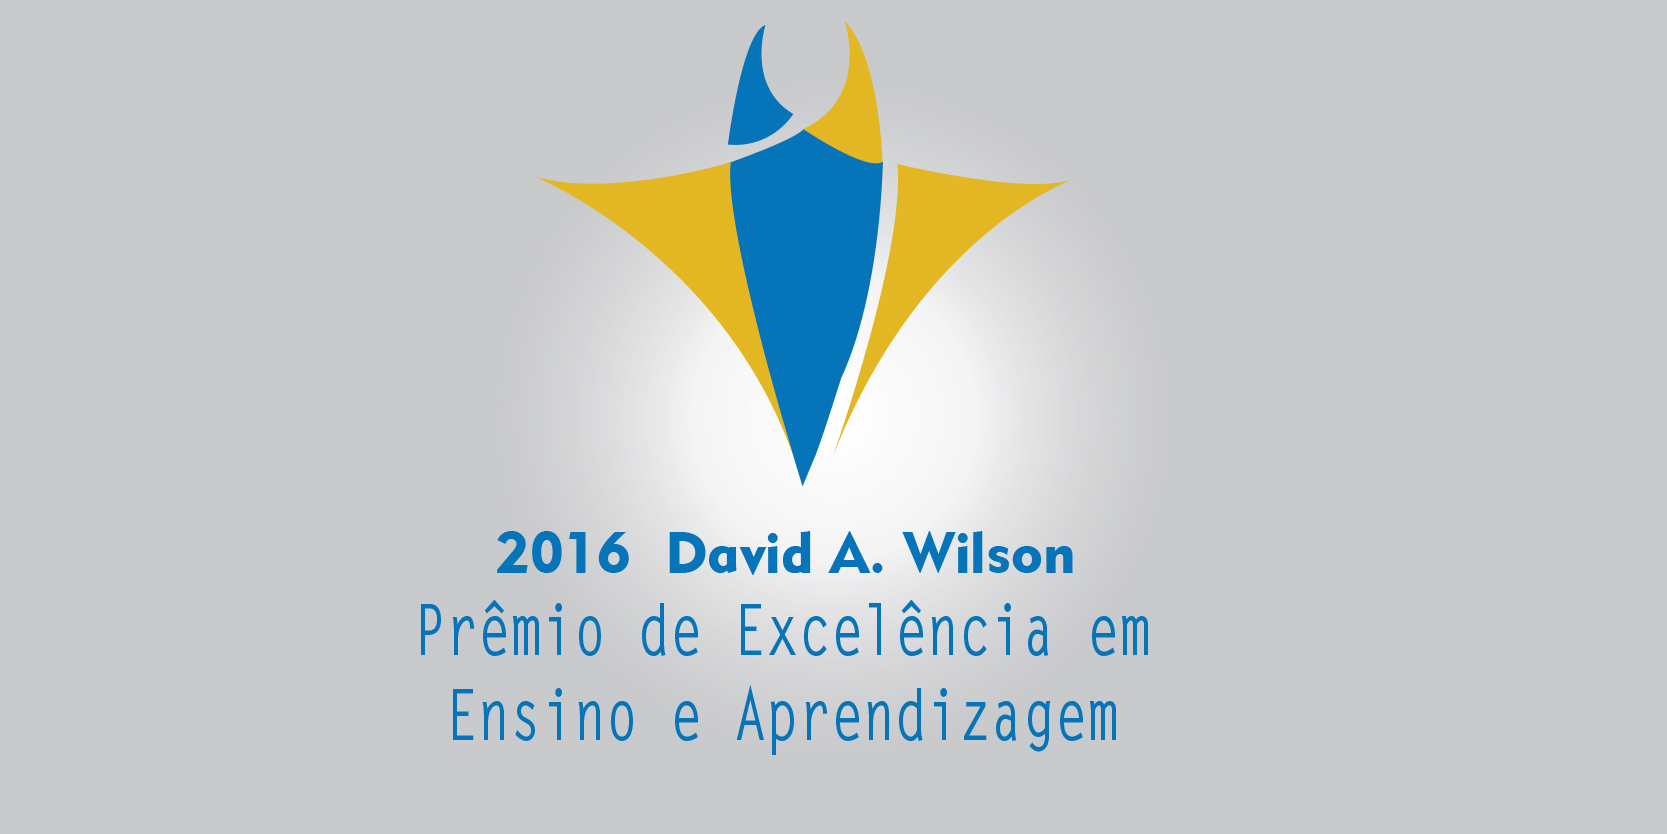 david a wilson